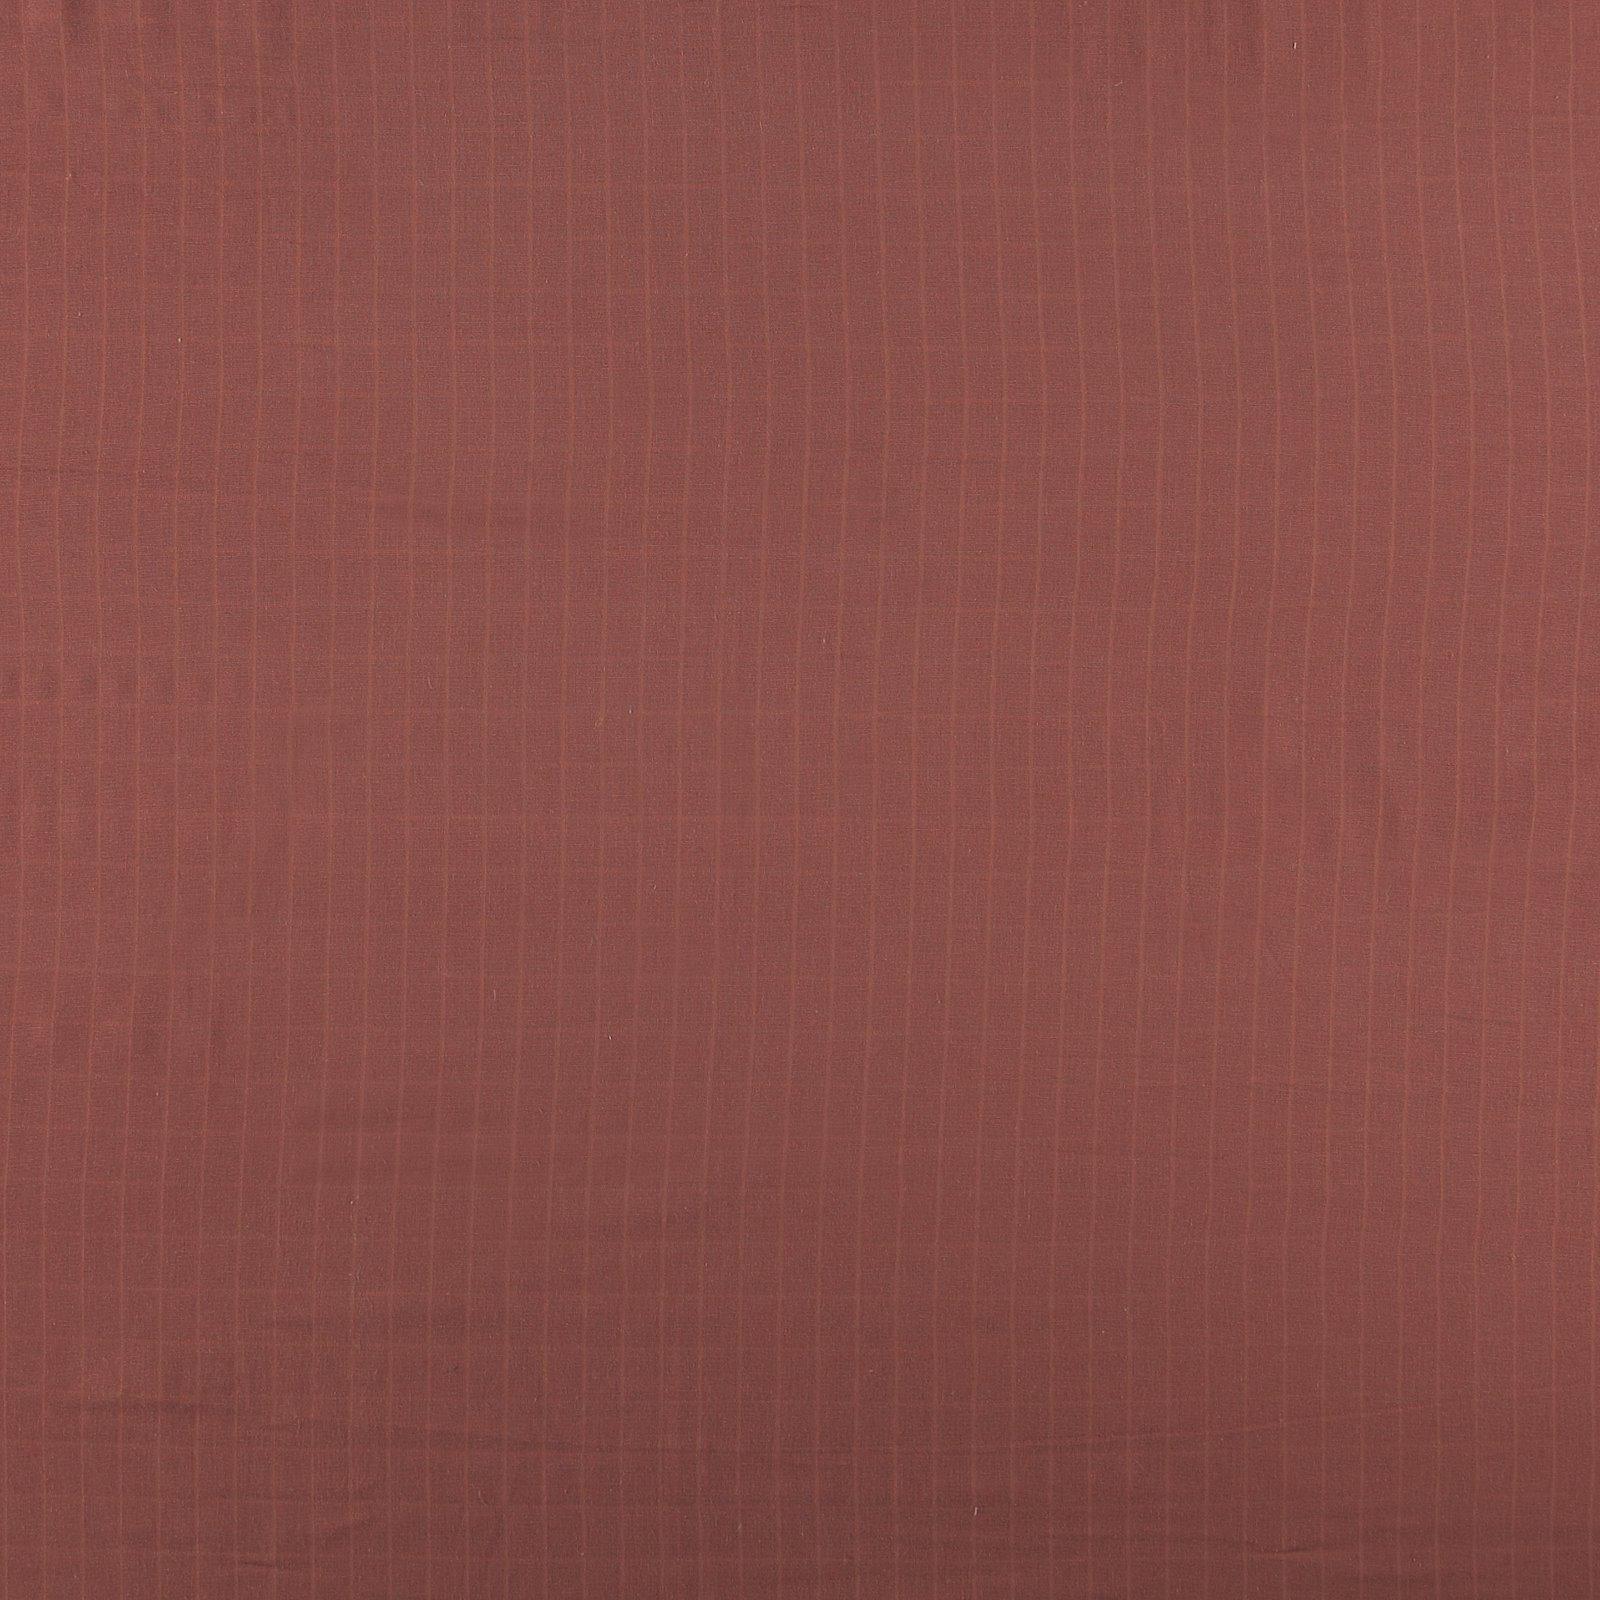 Muslin dusty red 501595_pack_sp